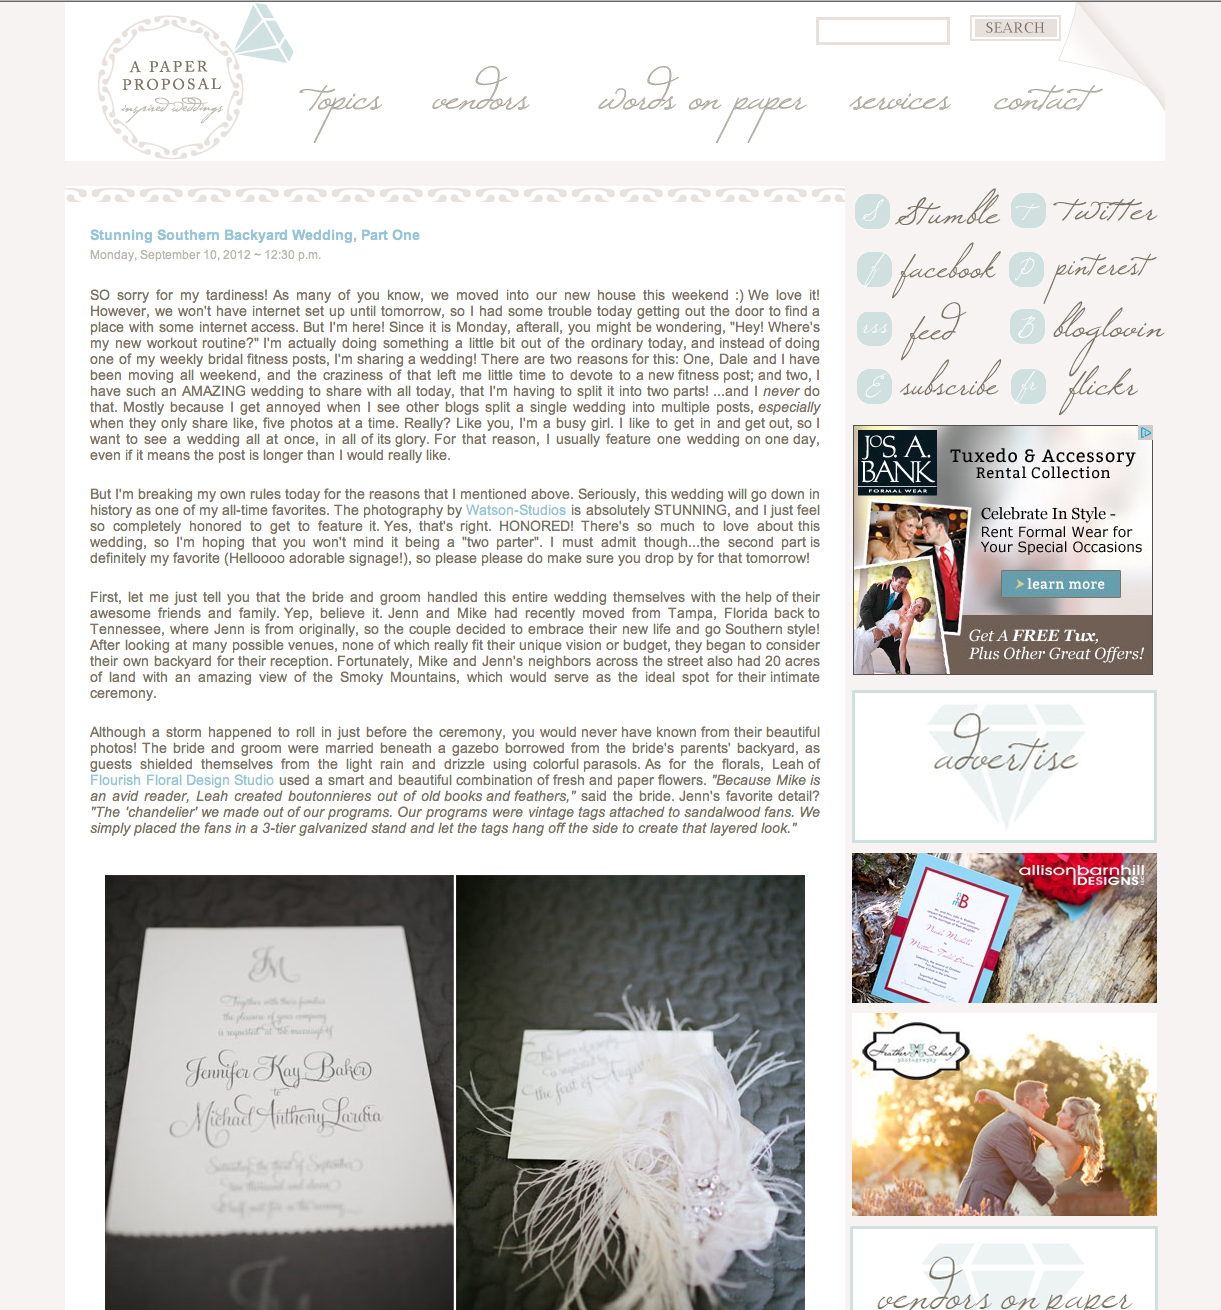 http://4.bp.blogspot.com/-TonnwKUs_oQ/UE95SzXZ1aI/AAAAAAAAB9I/wOkfrUmmP8E/s1600/PaperProposalPartOne.jpg